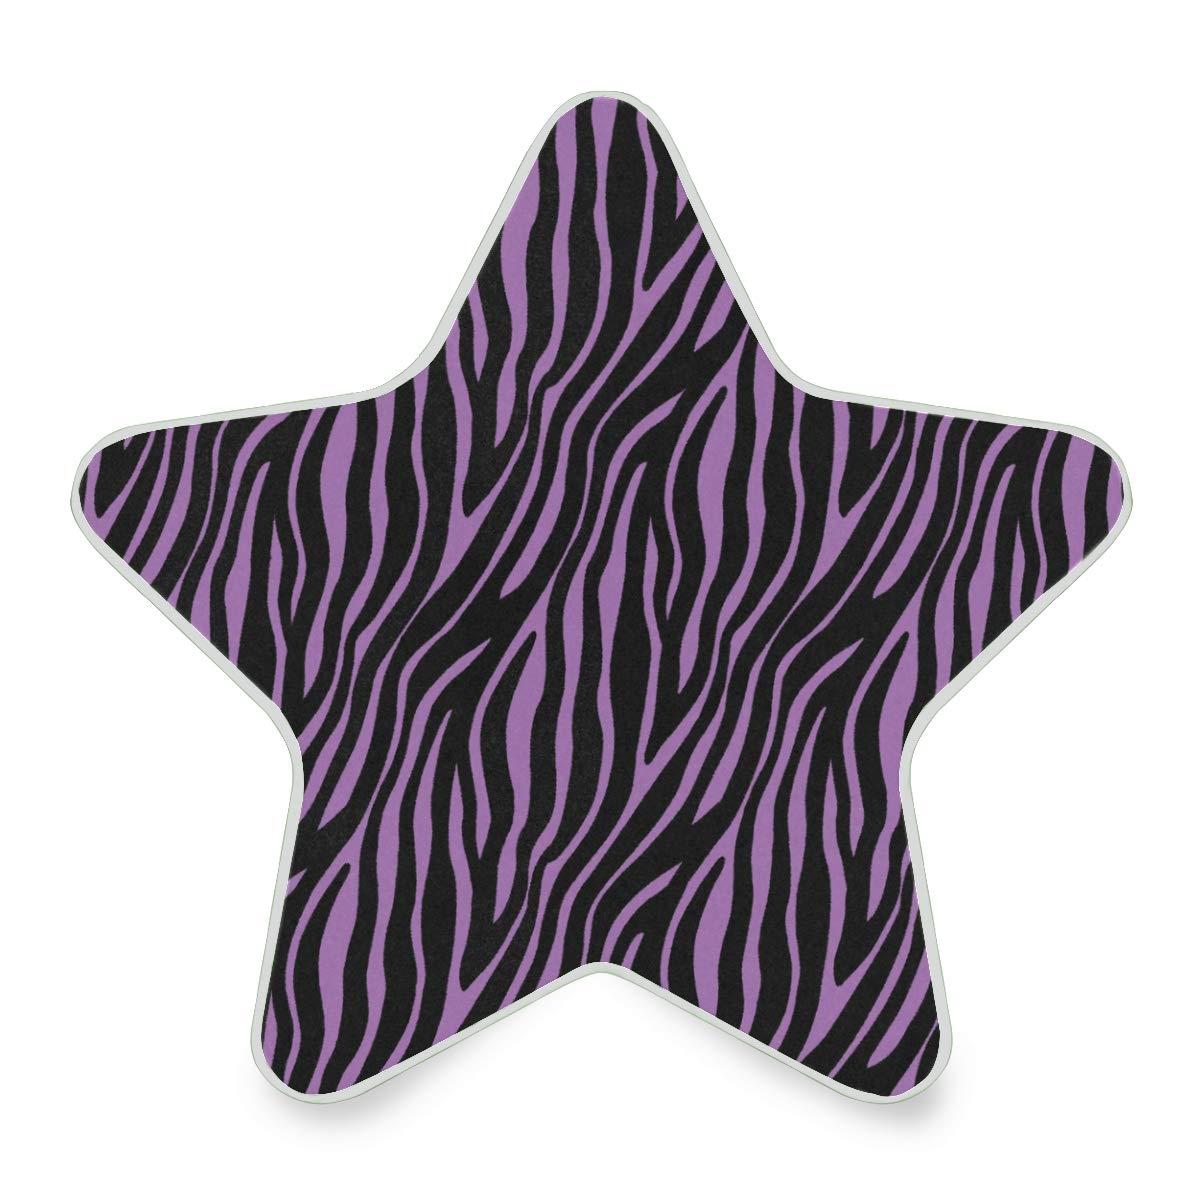 LED Night Light Purple Zebra Fur Skin Seamless Pattern Nightlight Decorative Star Pentagram Shaped Plug in for Kids Baby Girls Boys Adults Room